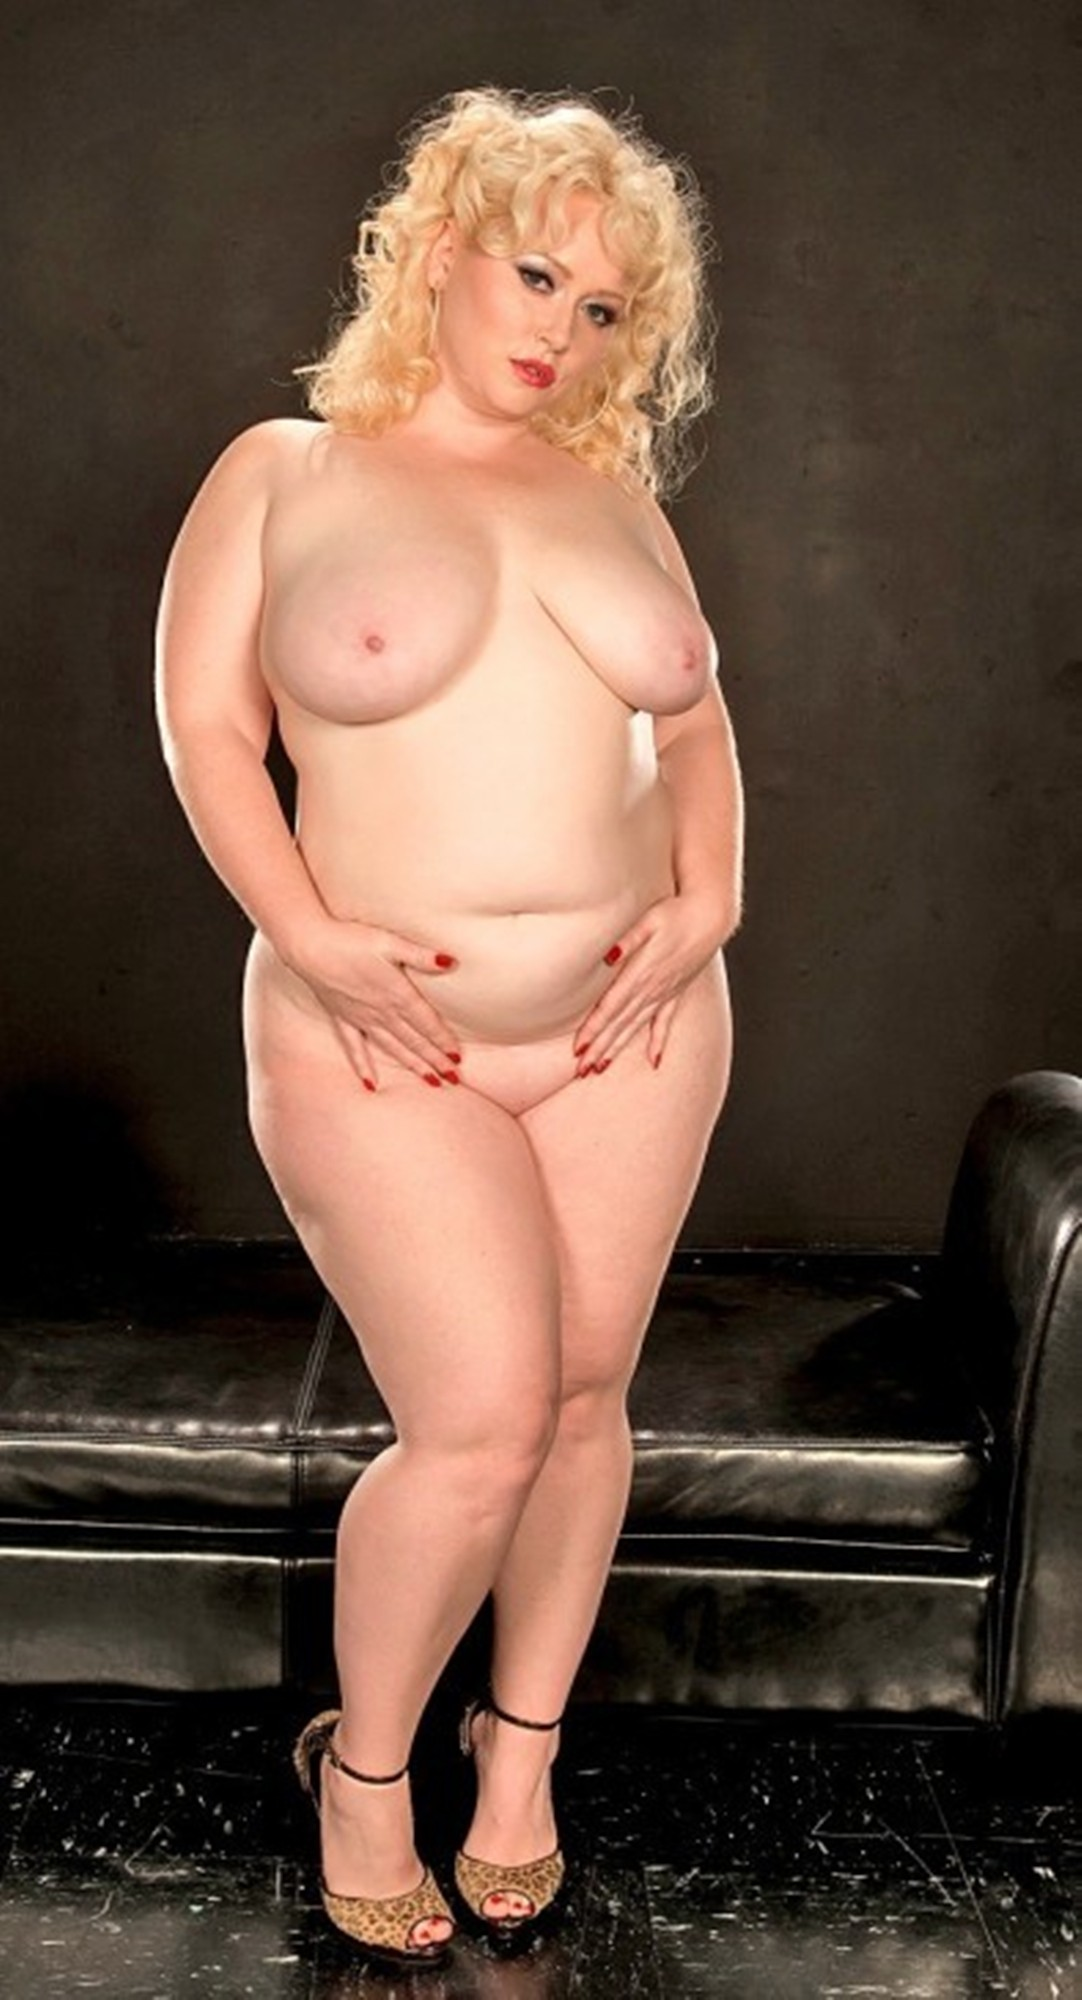 gree galleries chubby women jpg 1152x768